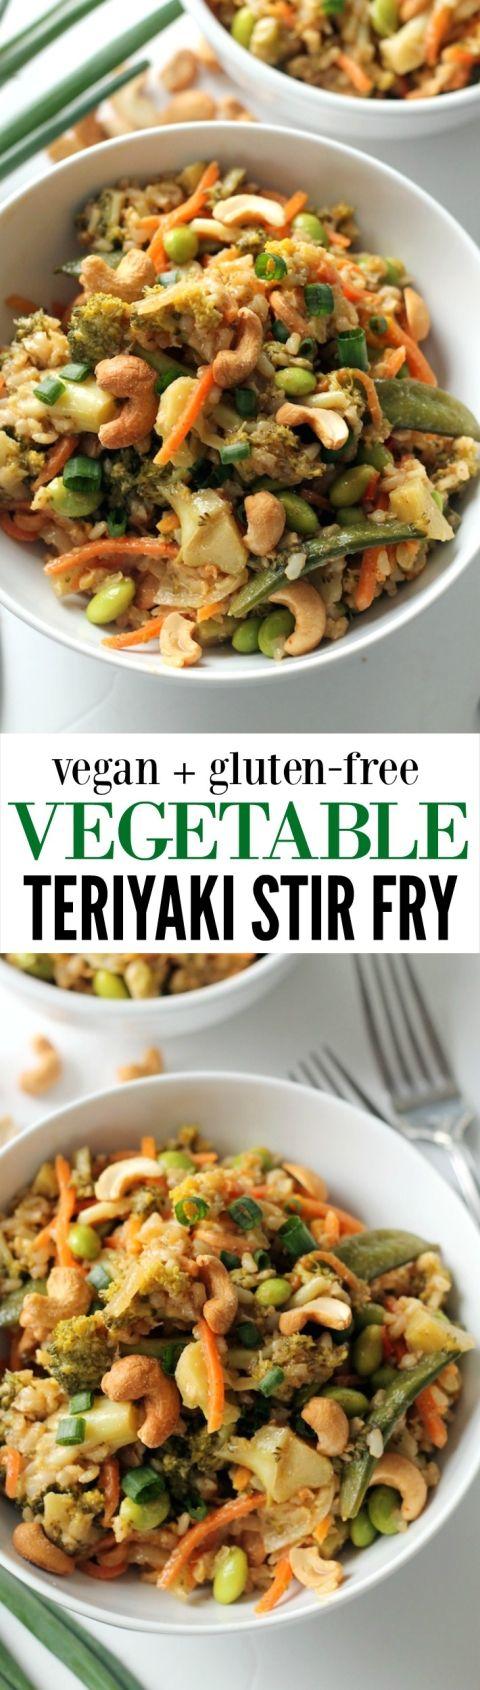 Easy vegetable teriyaki stir fry recipe asian inspired for Cucinare edamame